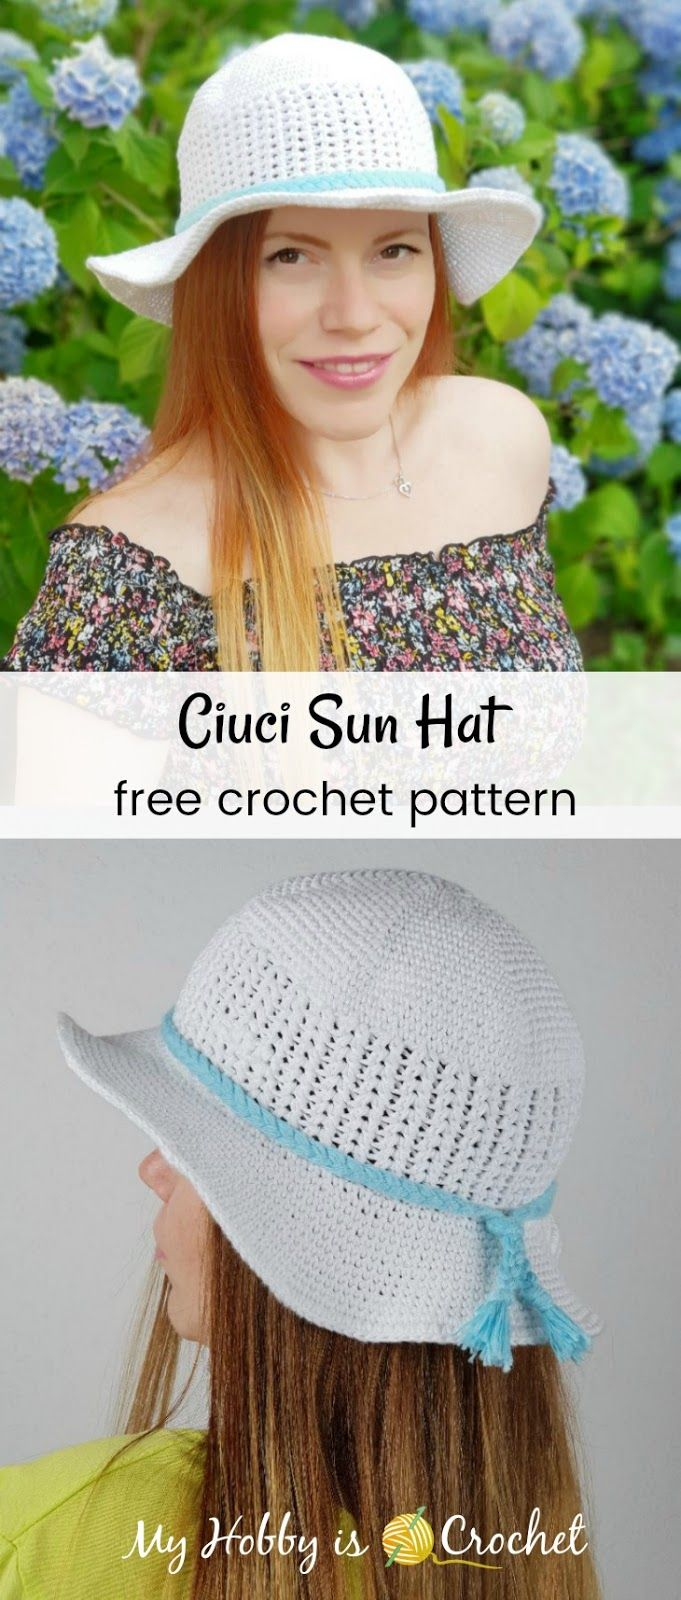 Ciuci Sun Hat - Free Crochet Pattern | CrochetHolic - HilariaFina ...